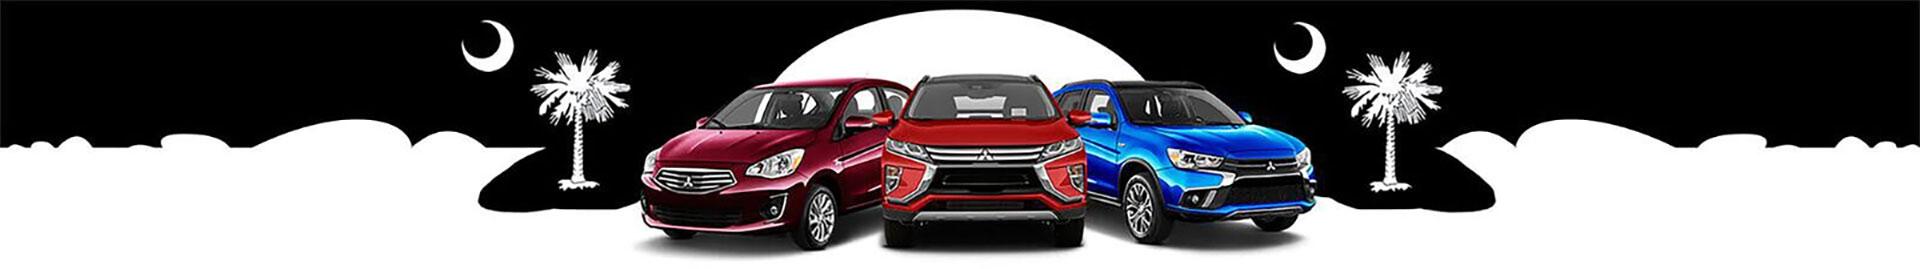 The Gilstrap Family Dealerships In South Carolina New Mitsubishis